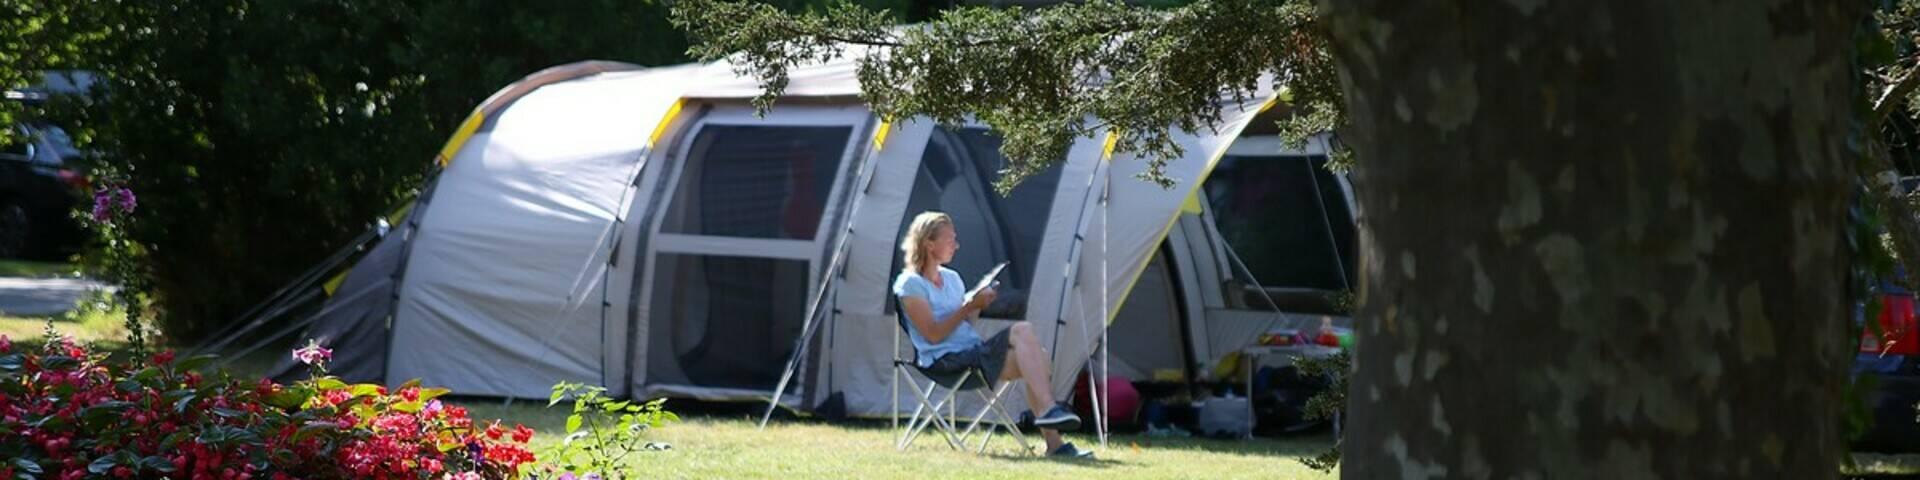 Lecture devant une toile de tente